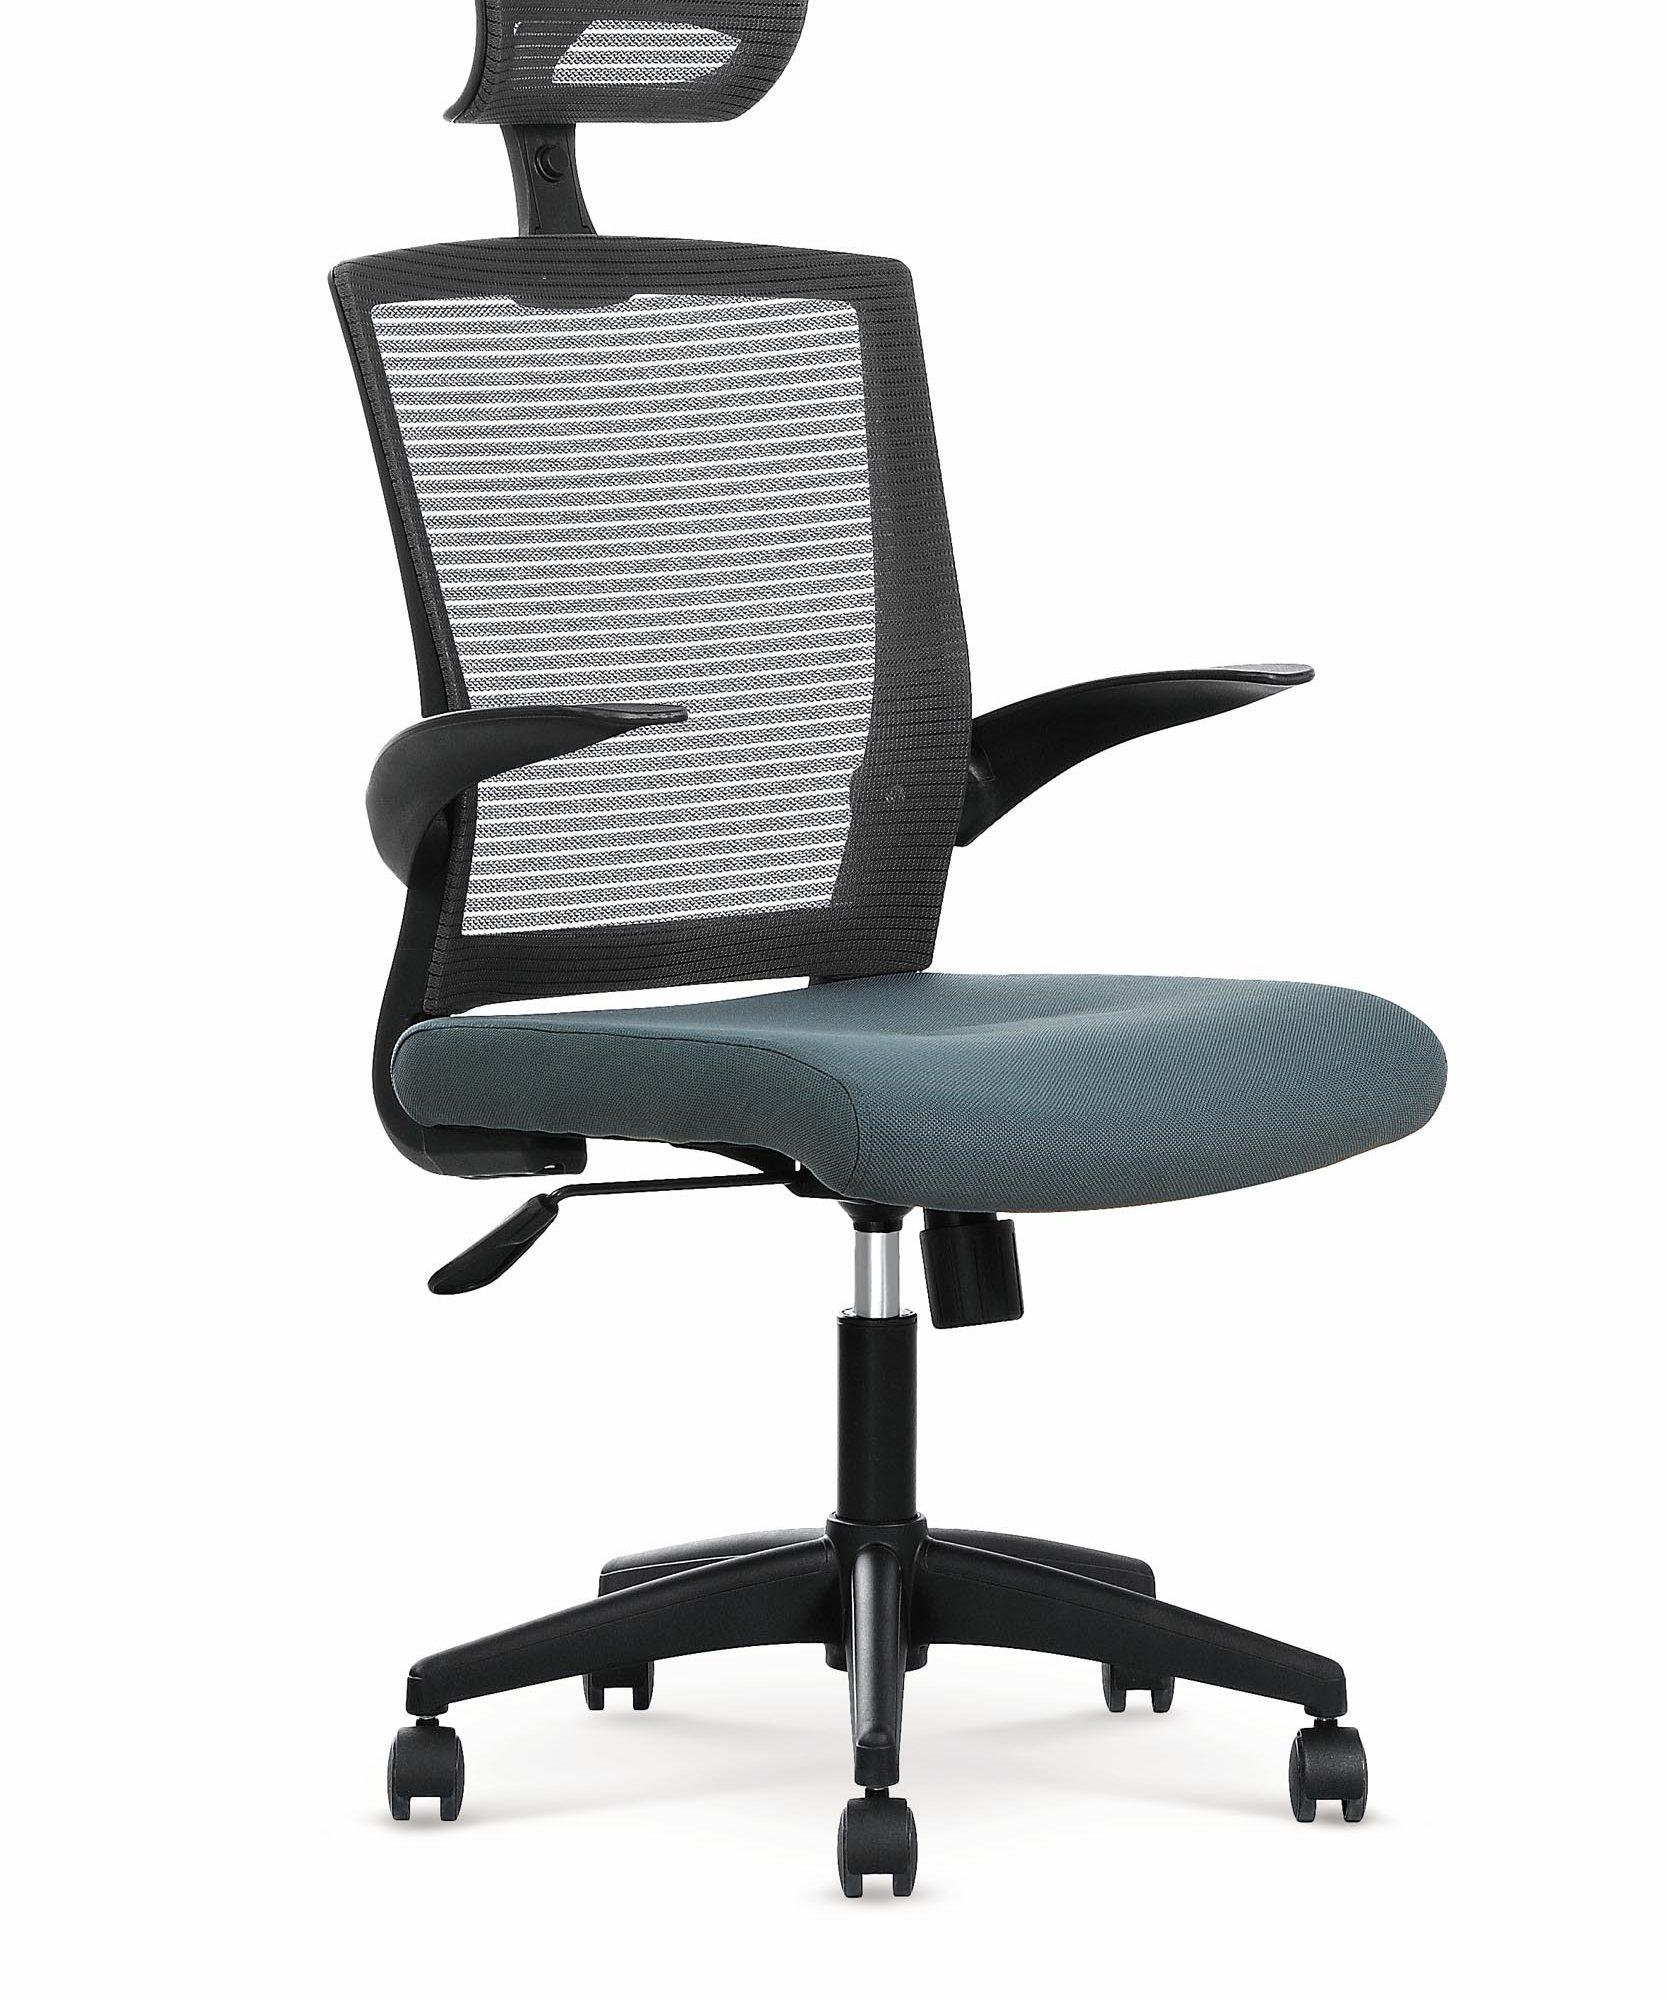 Scaun de birou ergonomic Valor Grey vivre.ro